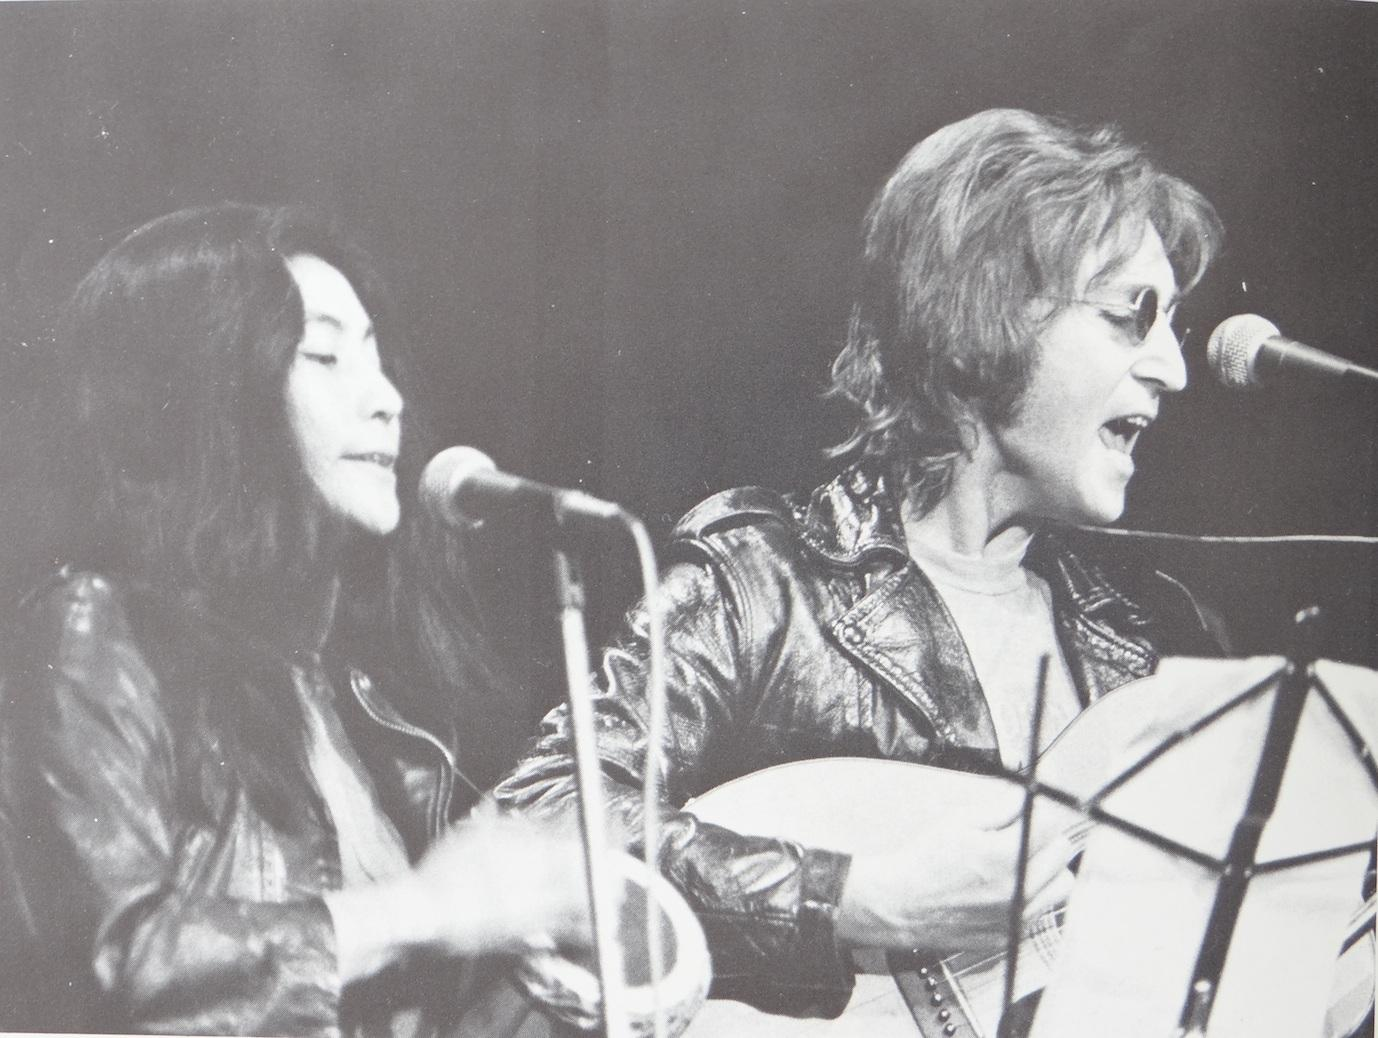 John Lennon and Yoko Ono perform